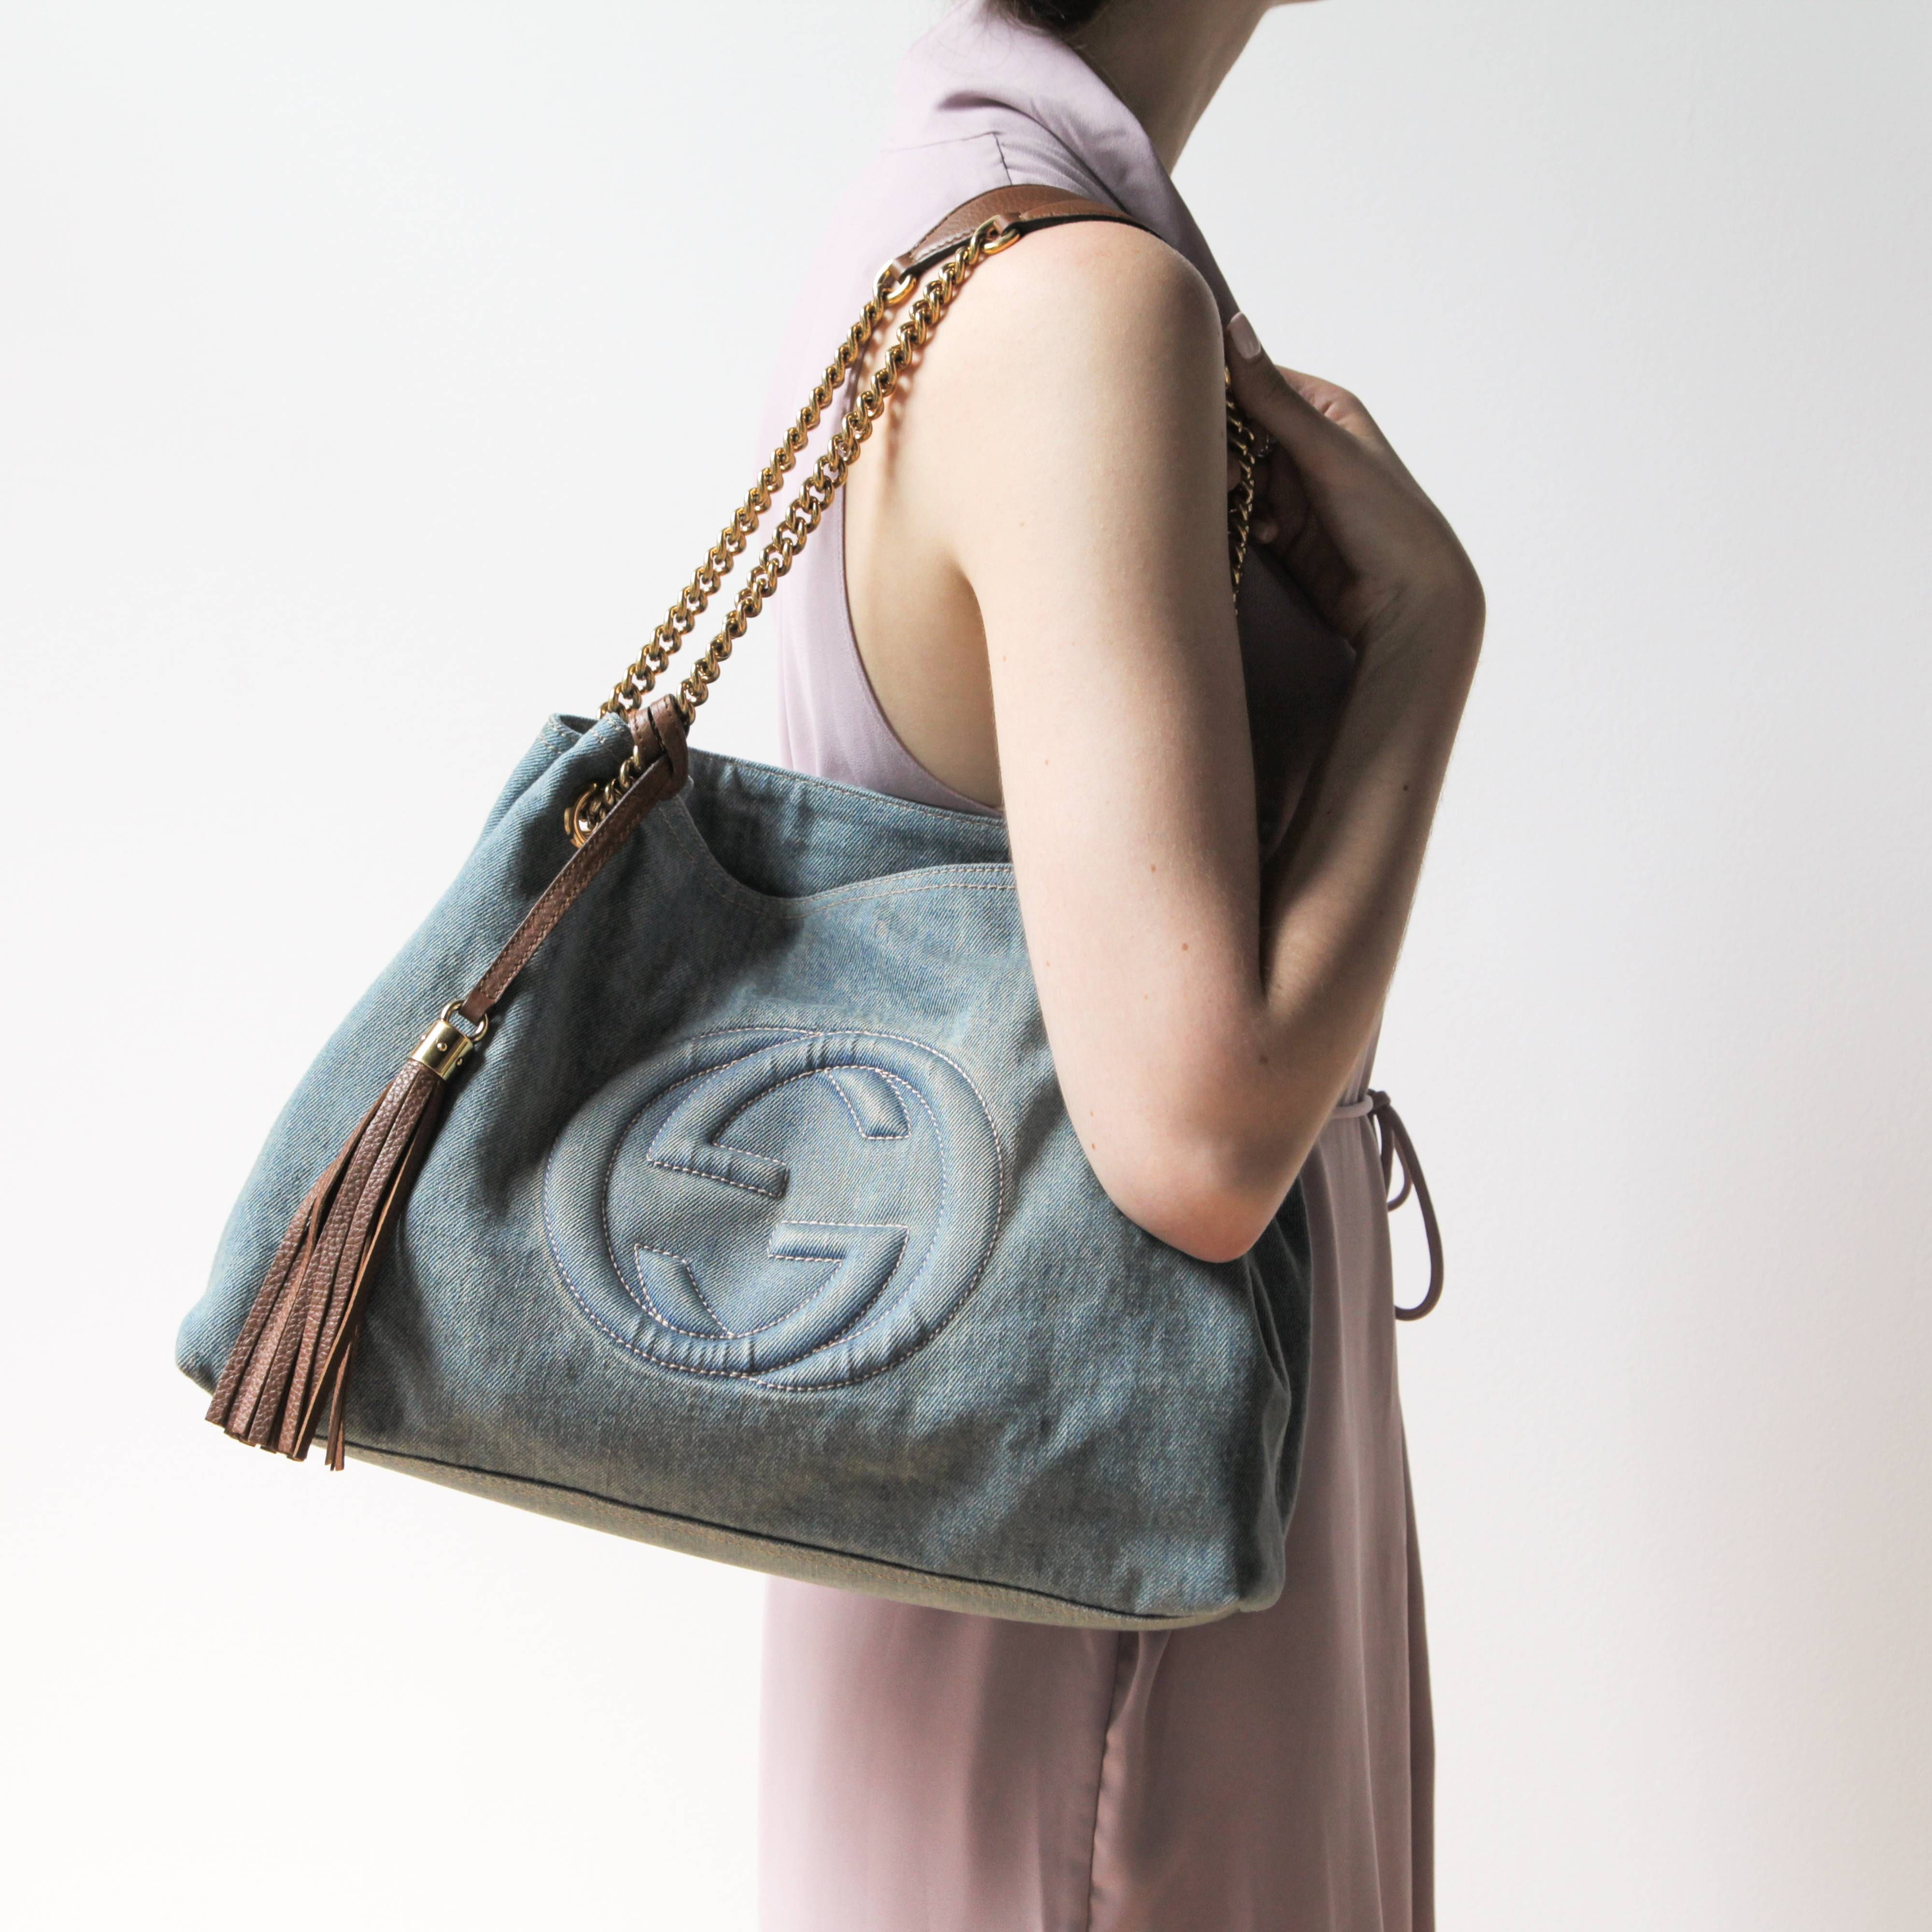 Gucci Soho Denim Shoulder Bag Denim Shoulder Bags Bags Best Tote Bags